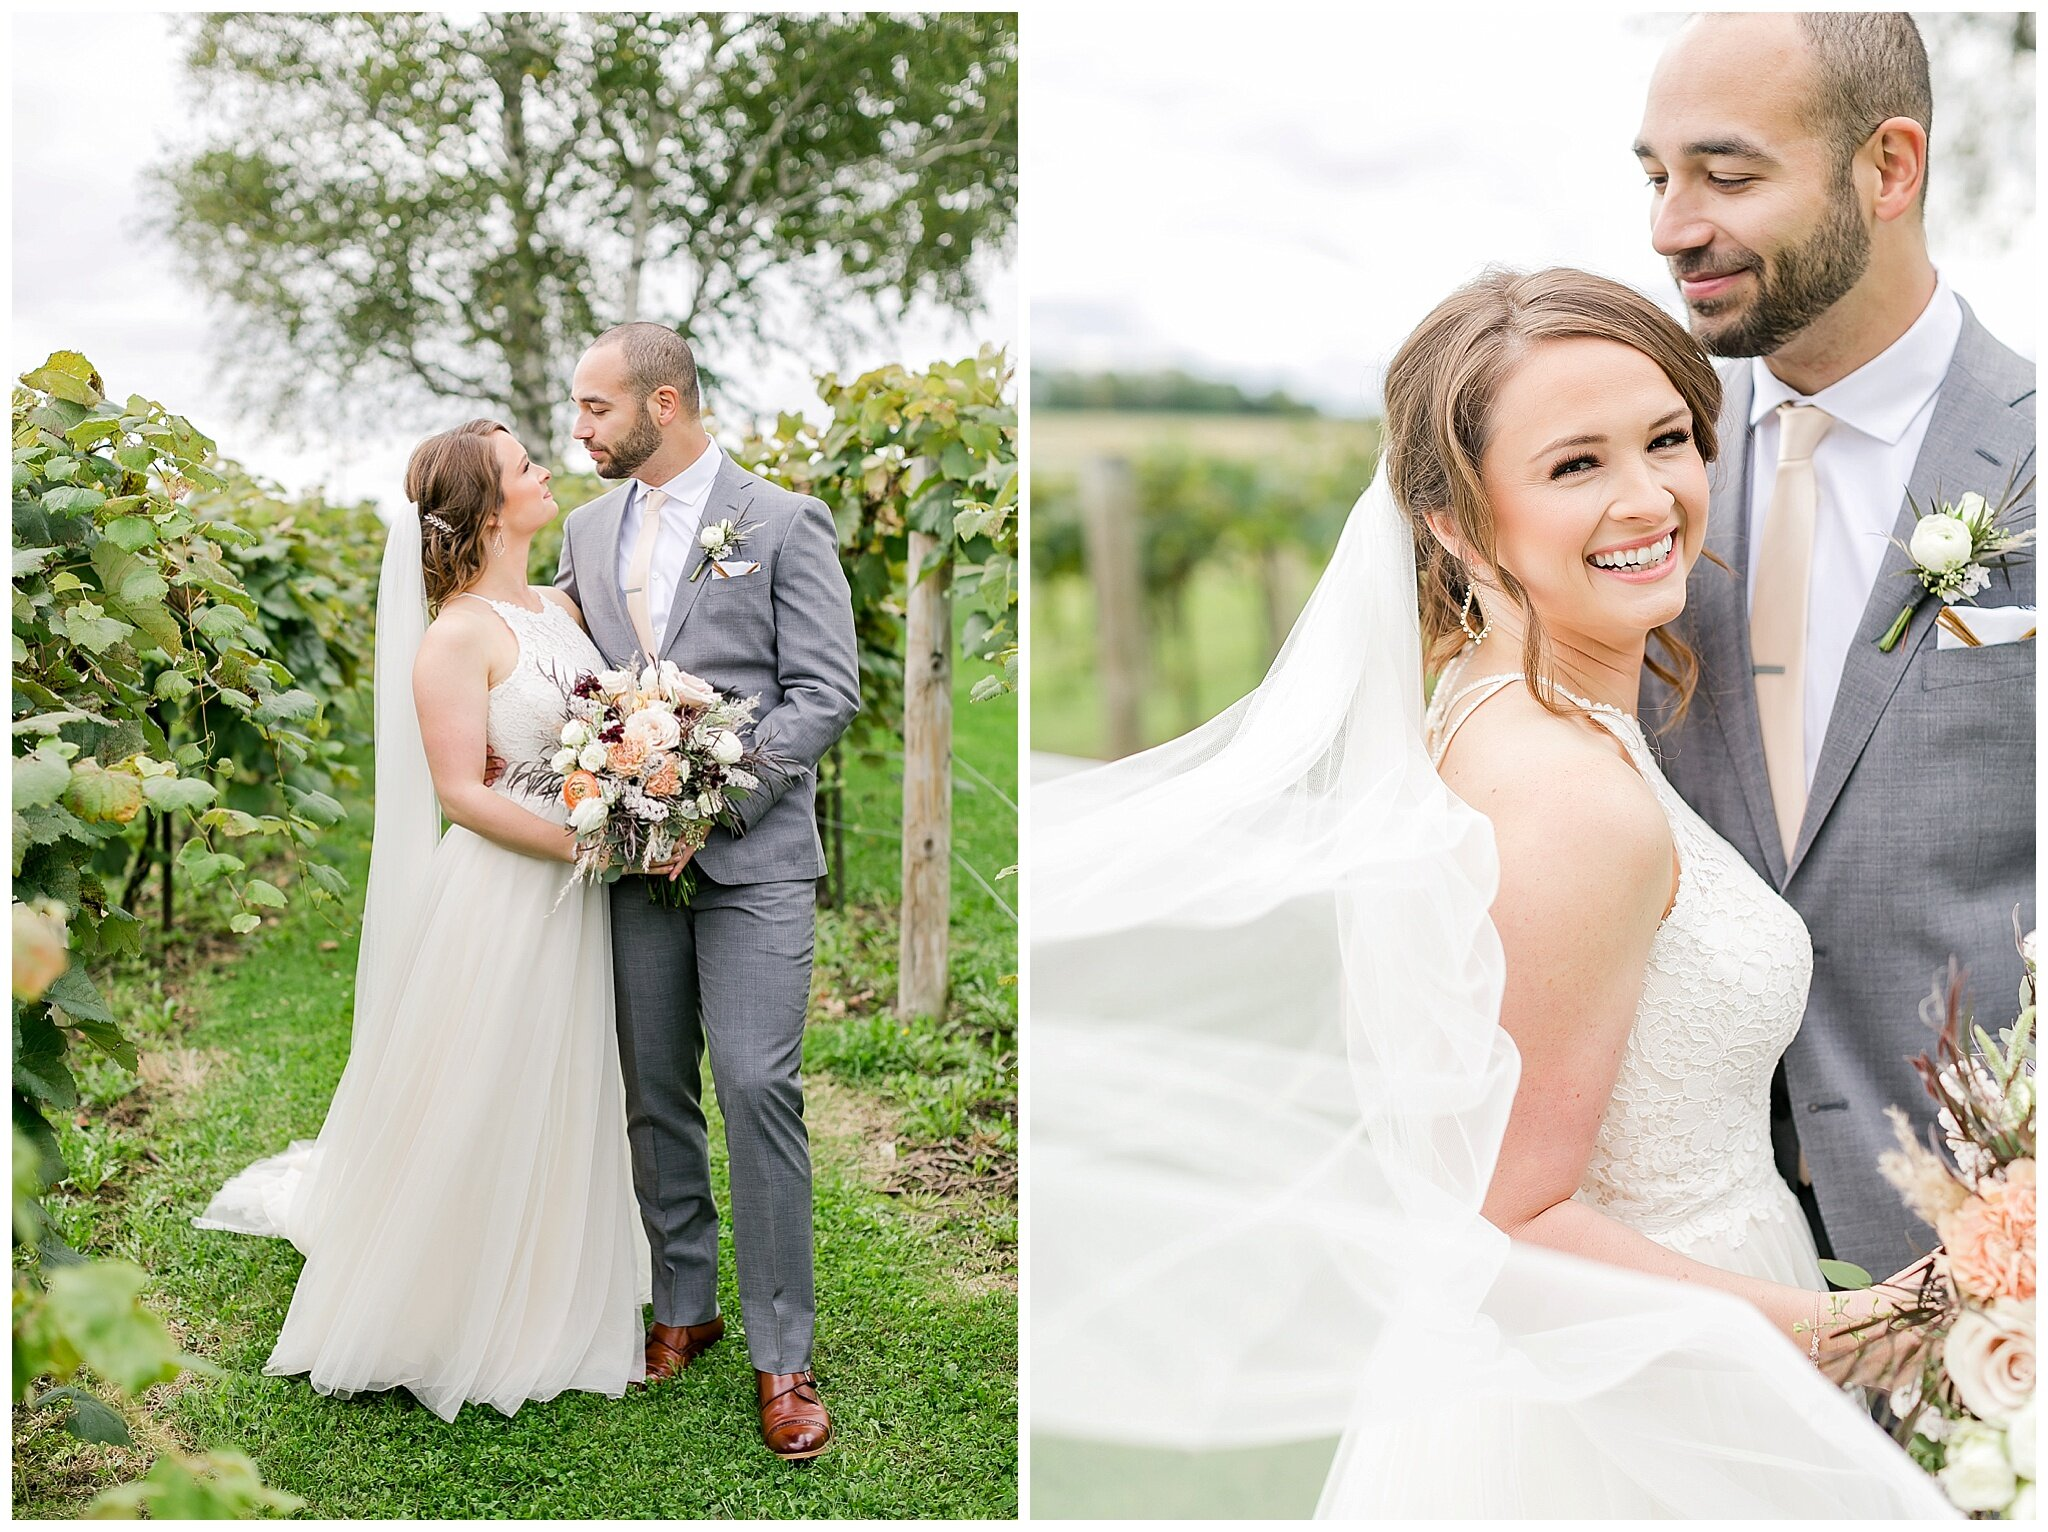 over_the_vines_edgerton_wisconsin_wedding_madison_wisconsin_photographer_0426.jpg